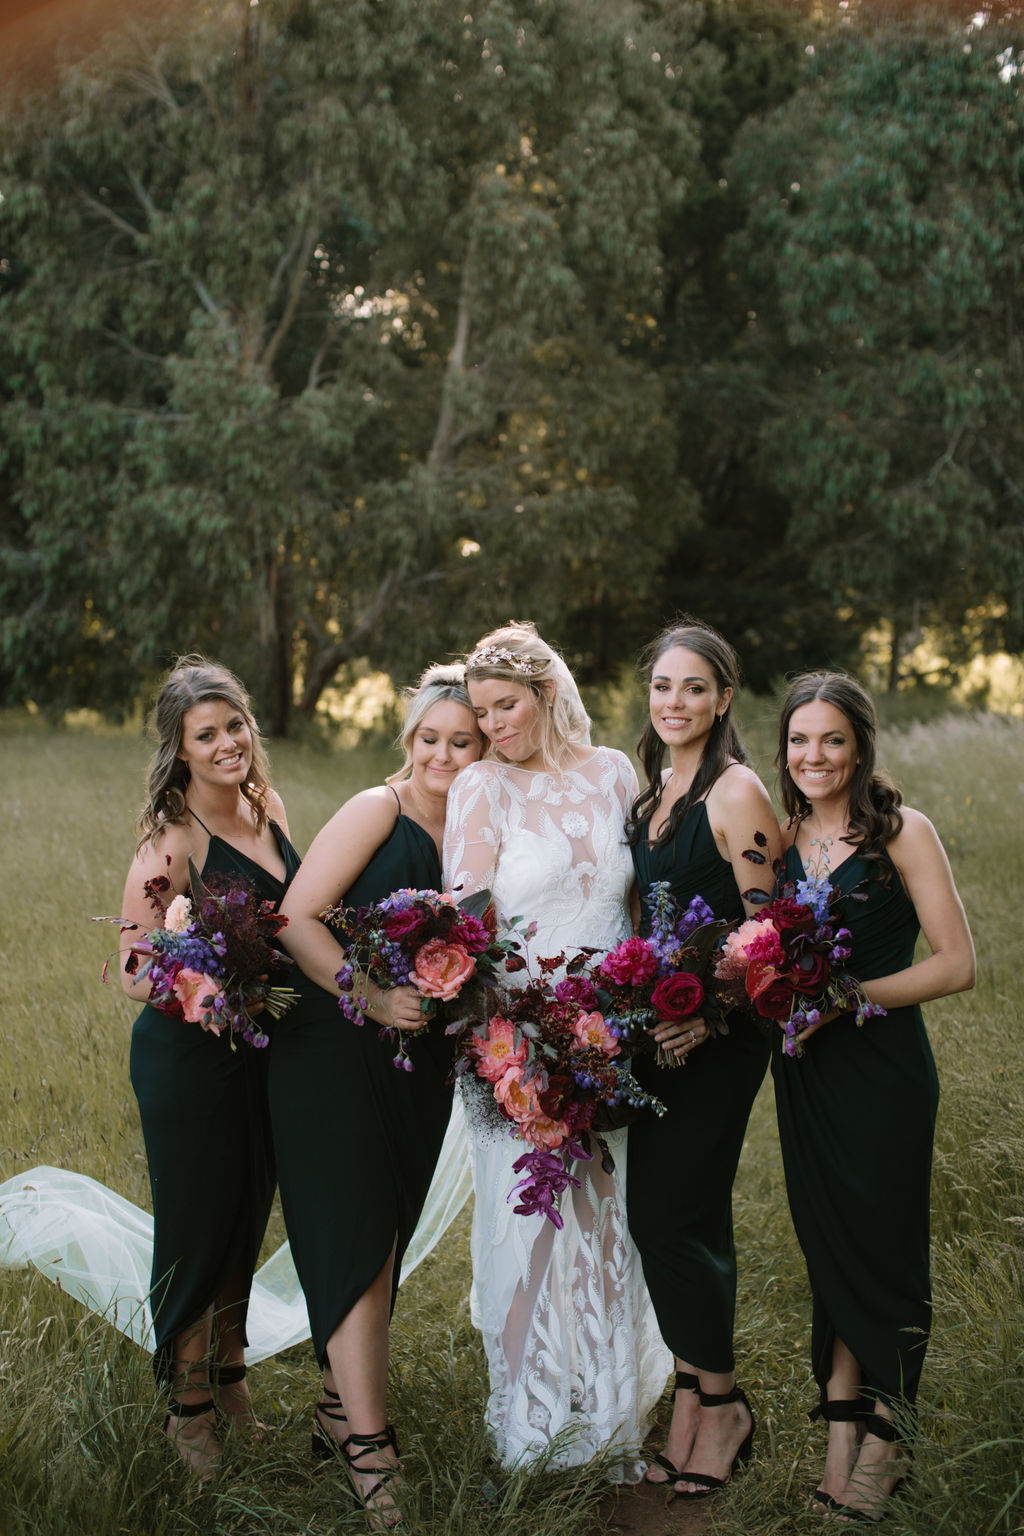 I-Got-You-Babe-Weddings-Erin-Dave703.JPG